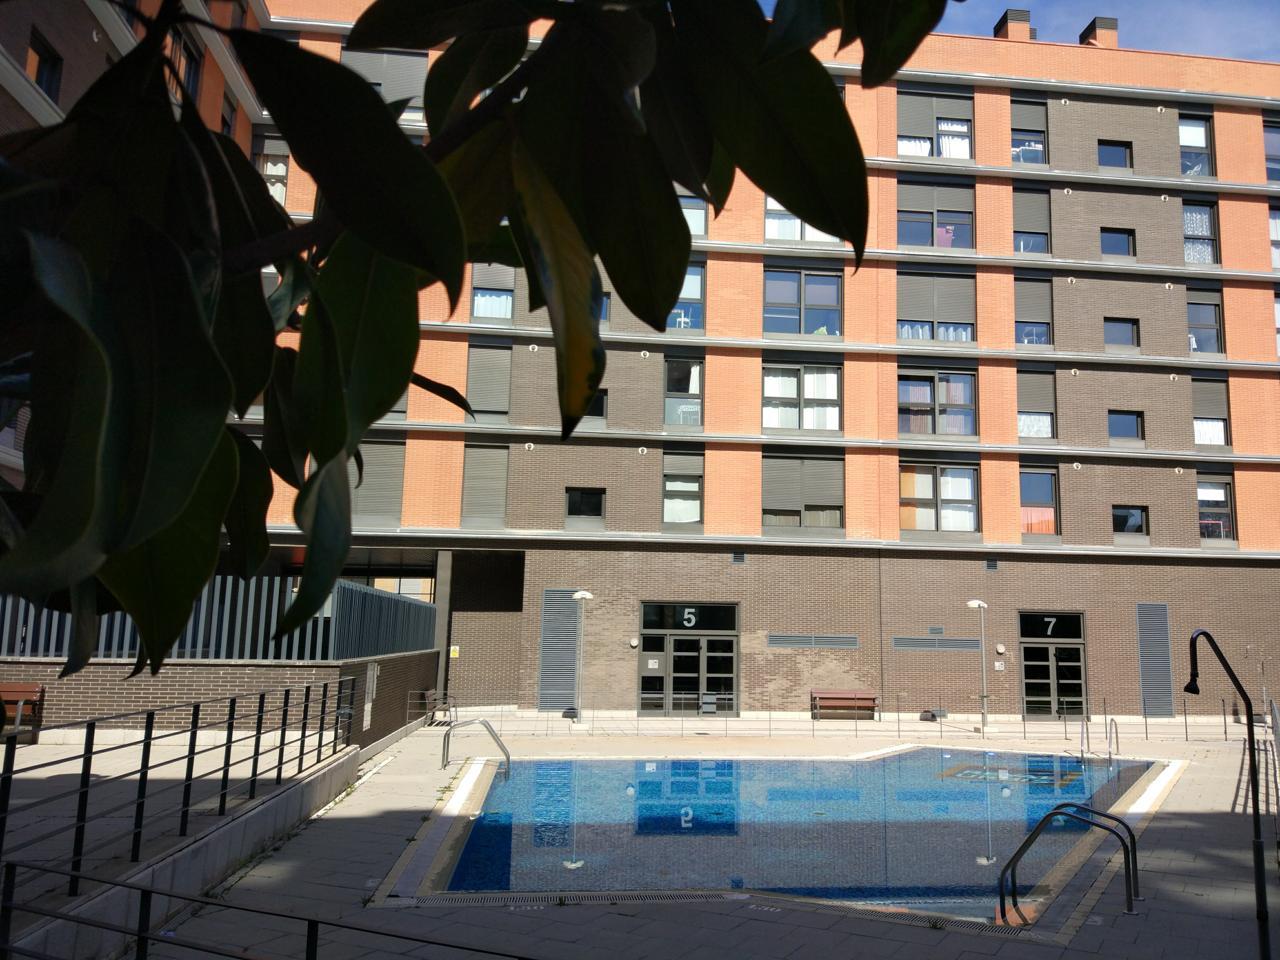 piso inversores con inquilino obra nueva zaragoza|publipisos inmobiliarias-8